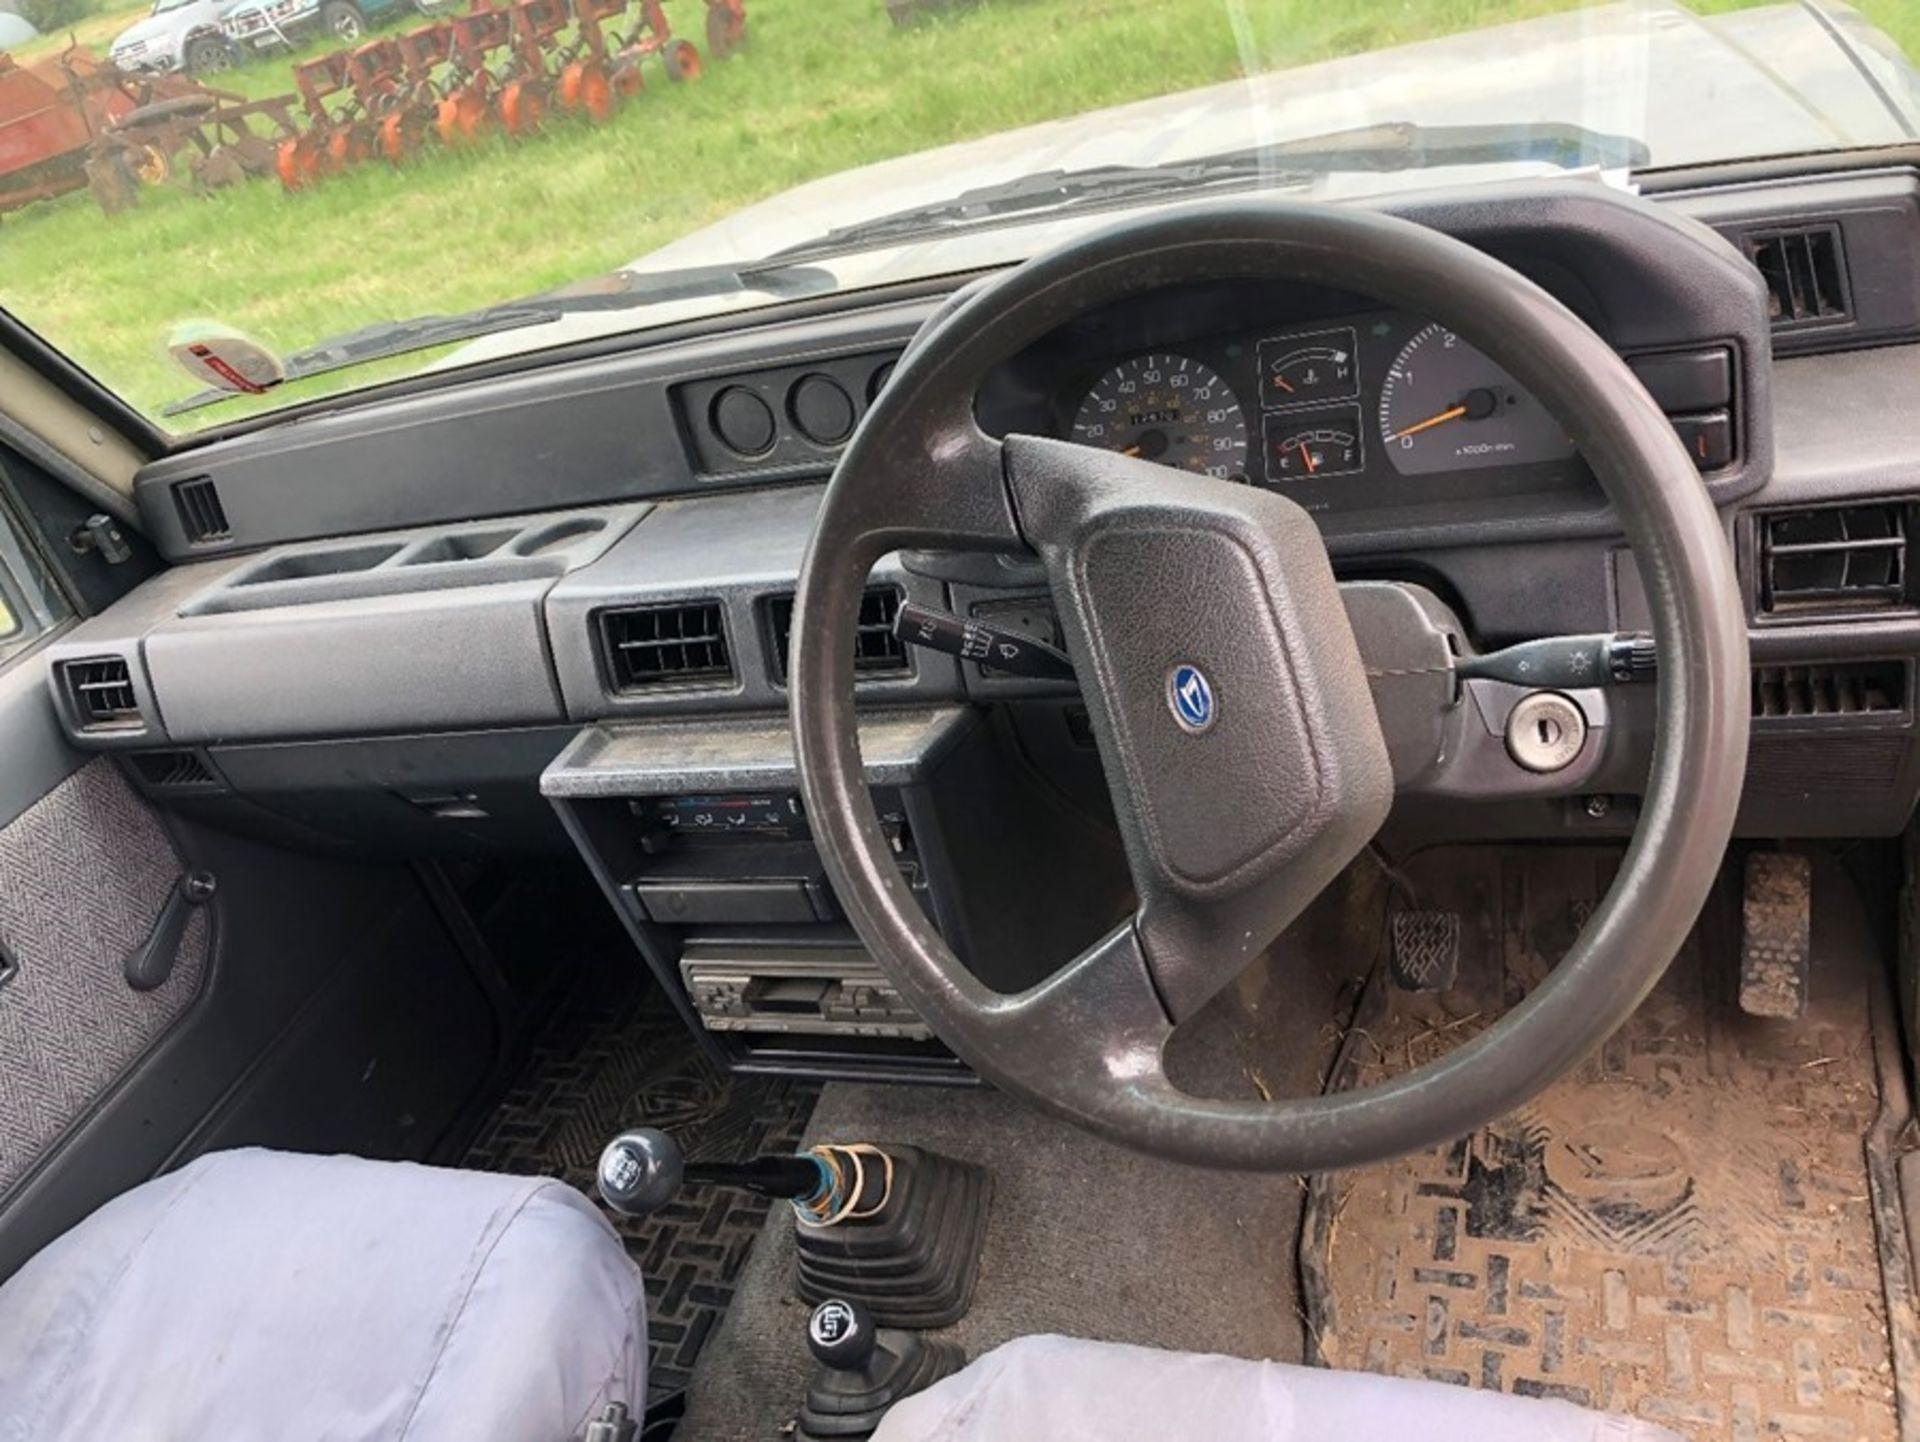 (90) Daihatsu Fourtrak TDL Commercial, 129,700 miles, one owner, no MOT, Reg R571 MEW, 1 key in - Image 8 of 9